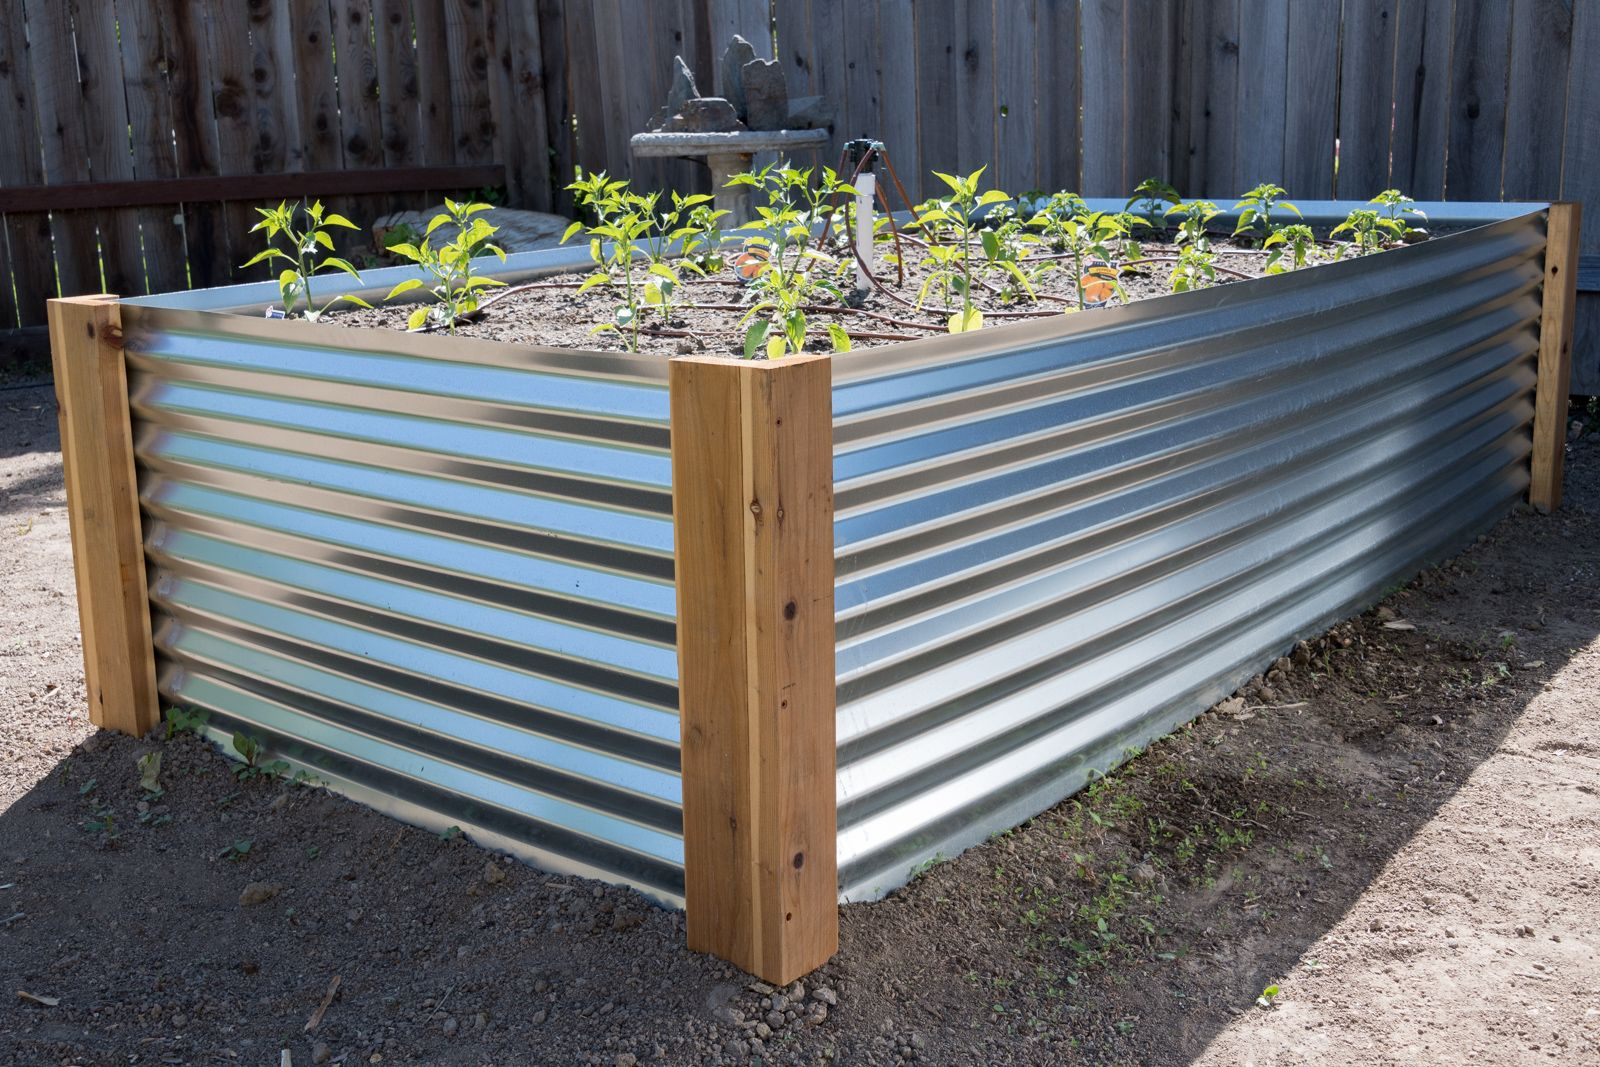 How To Build A Raised Metal Garden Bed Metal Garden Beds Building A Raised Garden Metal Raised Garden Beds